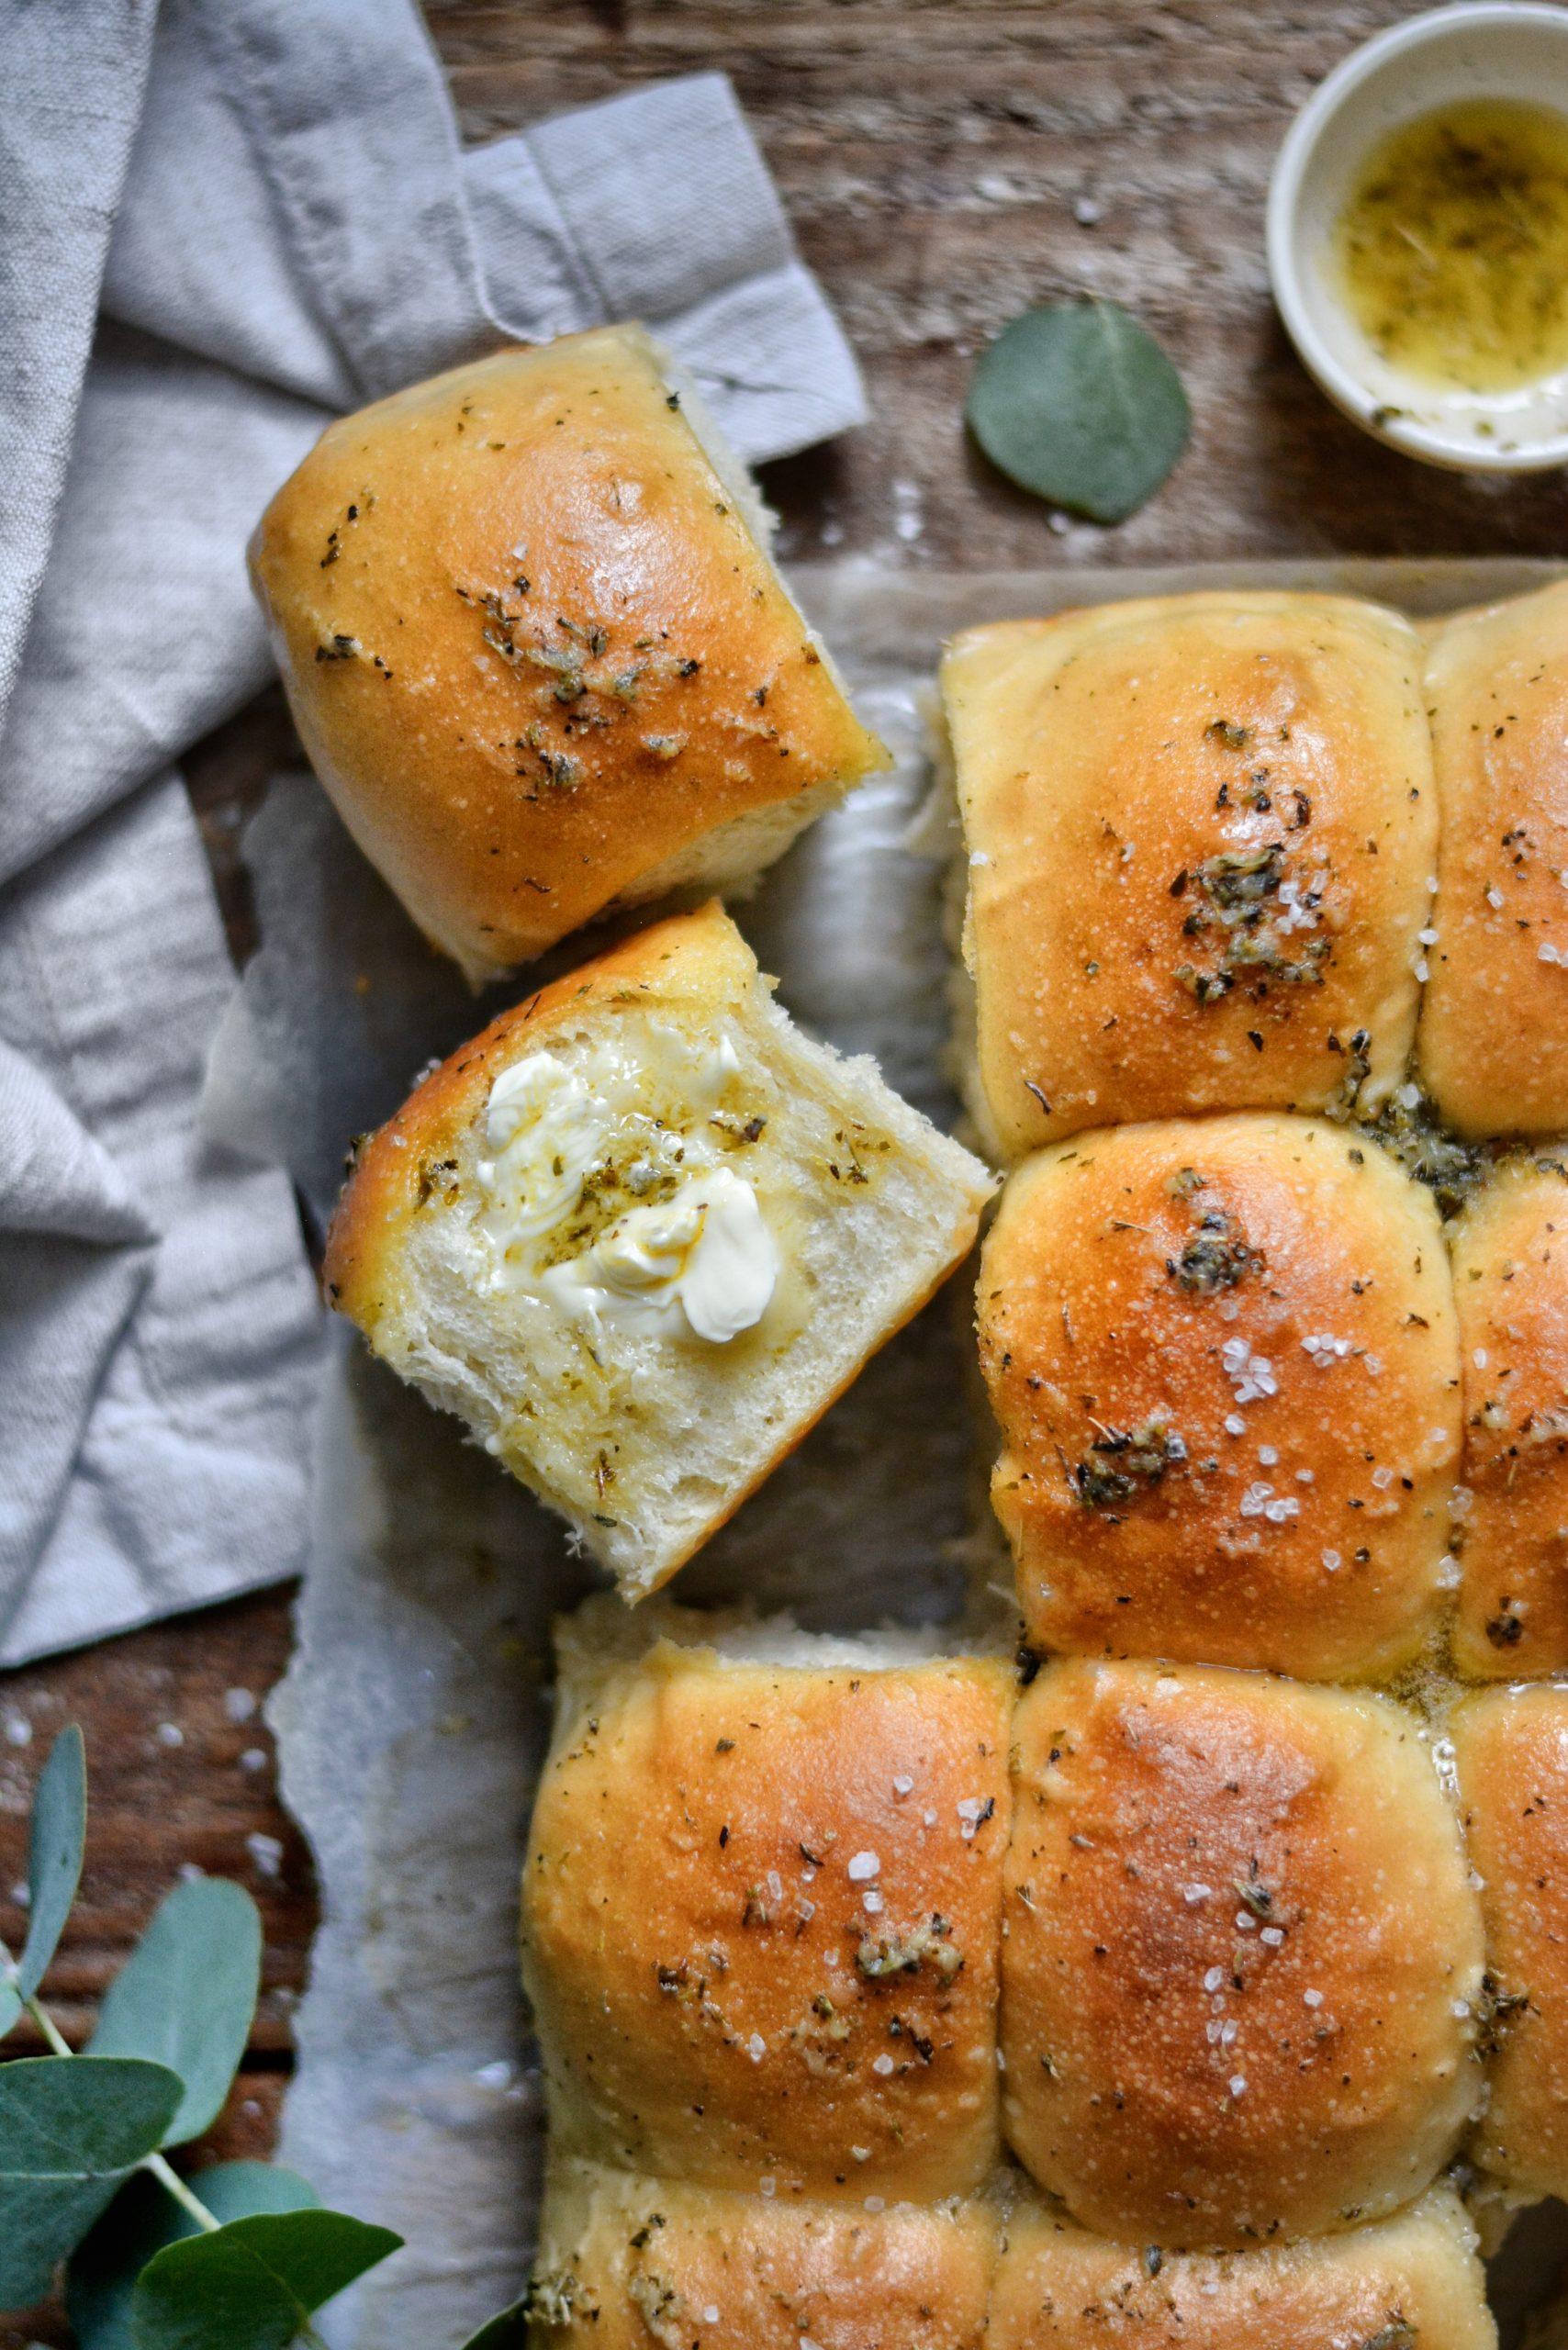 Pain Vegan au Beurre, Ail et Origan / Vegan Buttery, Garlic, Origano Pull Apart Bread